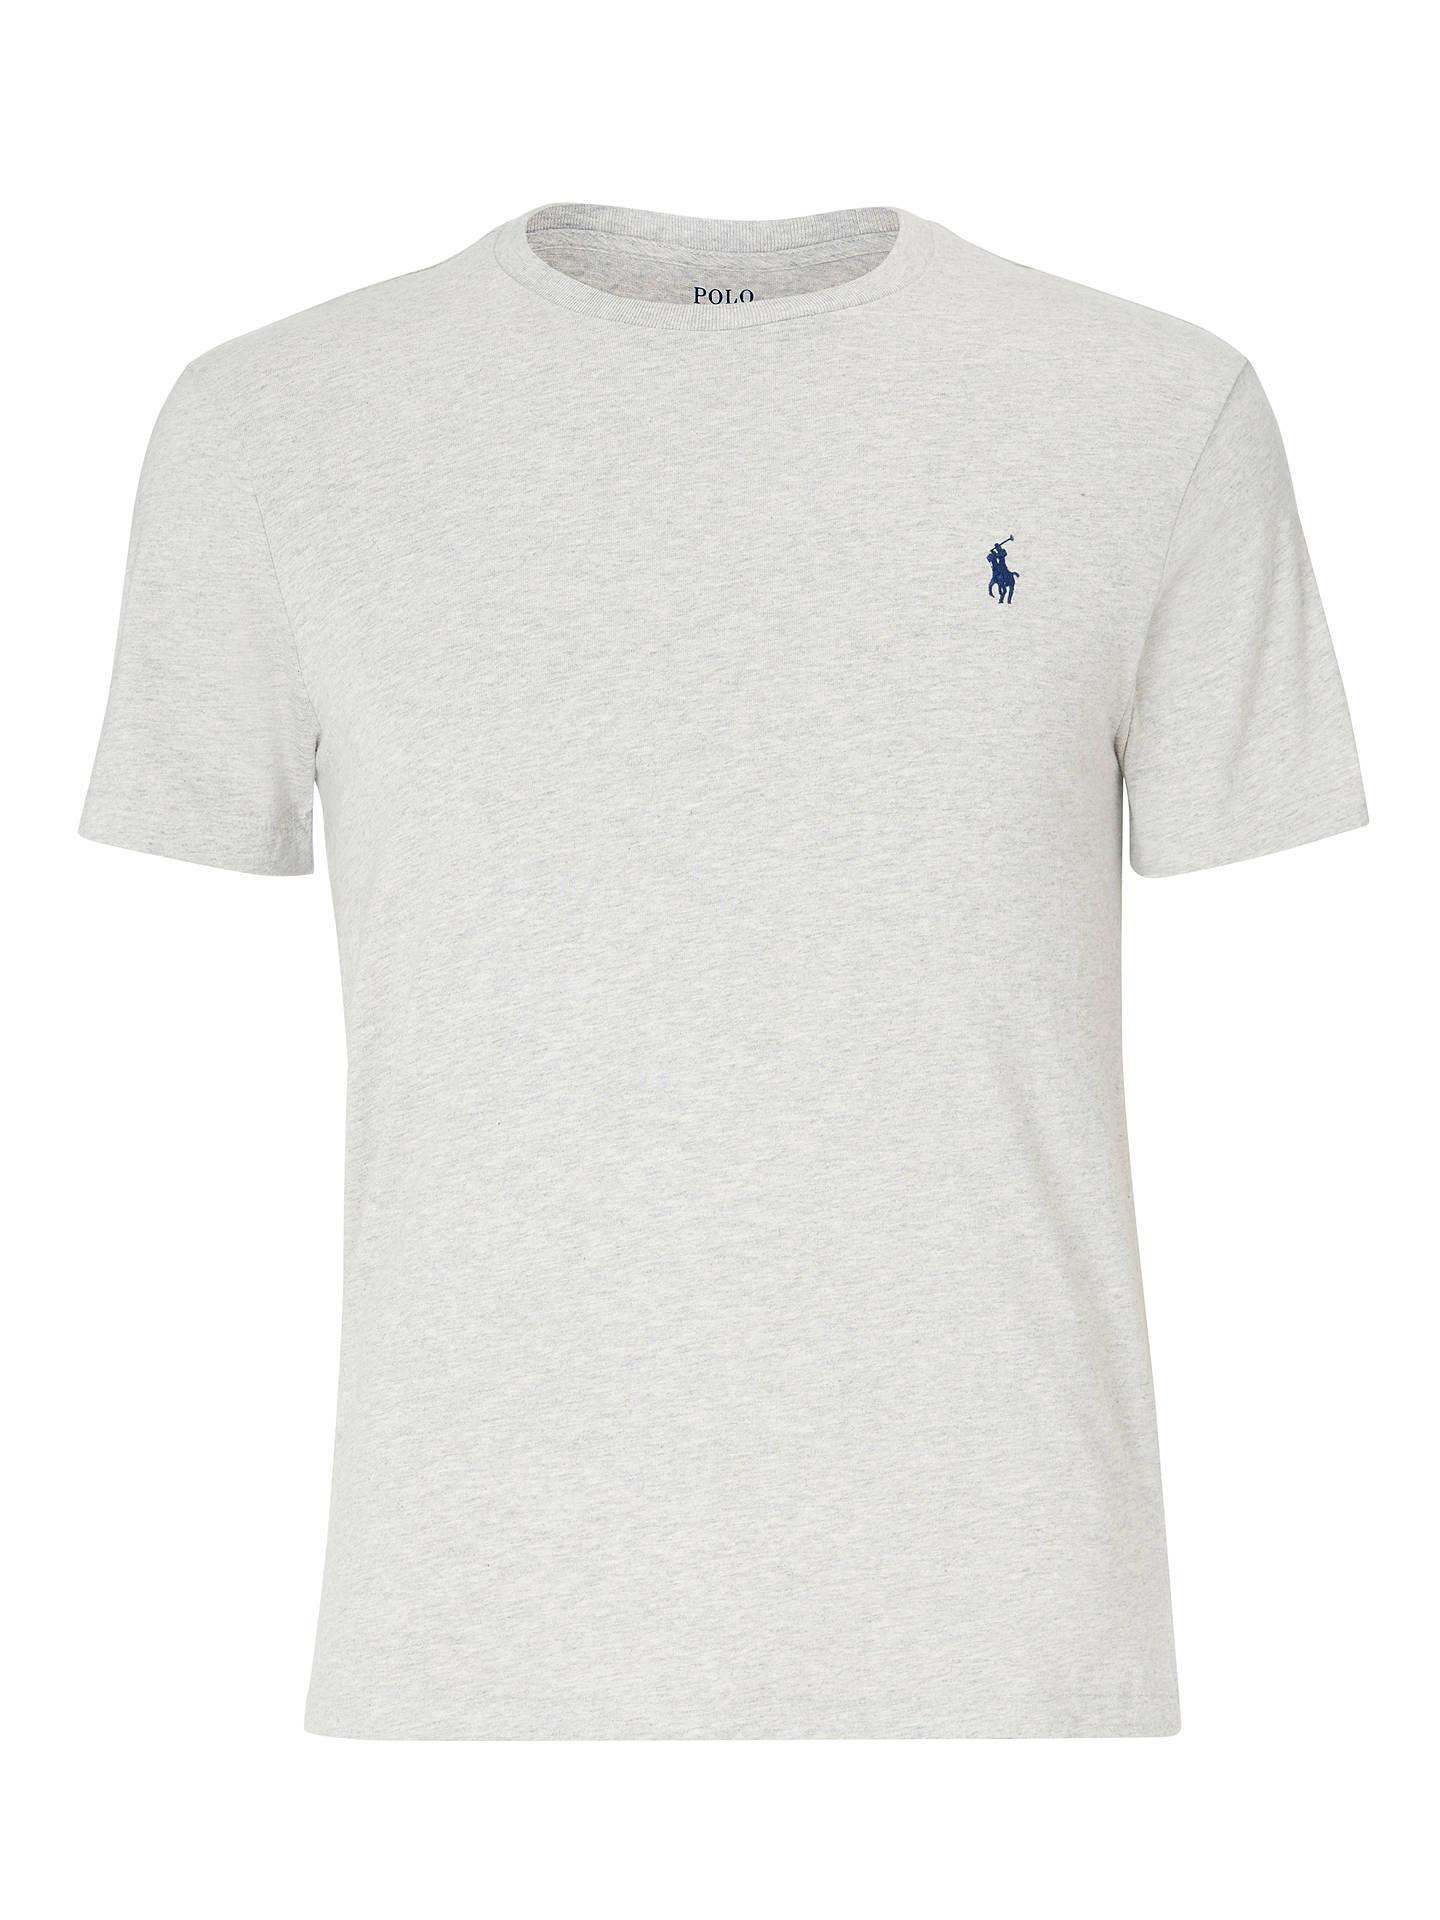 e96f2038 ... Buy Polo Ralph Lauren Short Sleeve Custom Fit Crew Neck T-Shirt, New  Heather